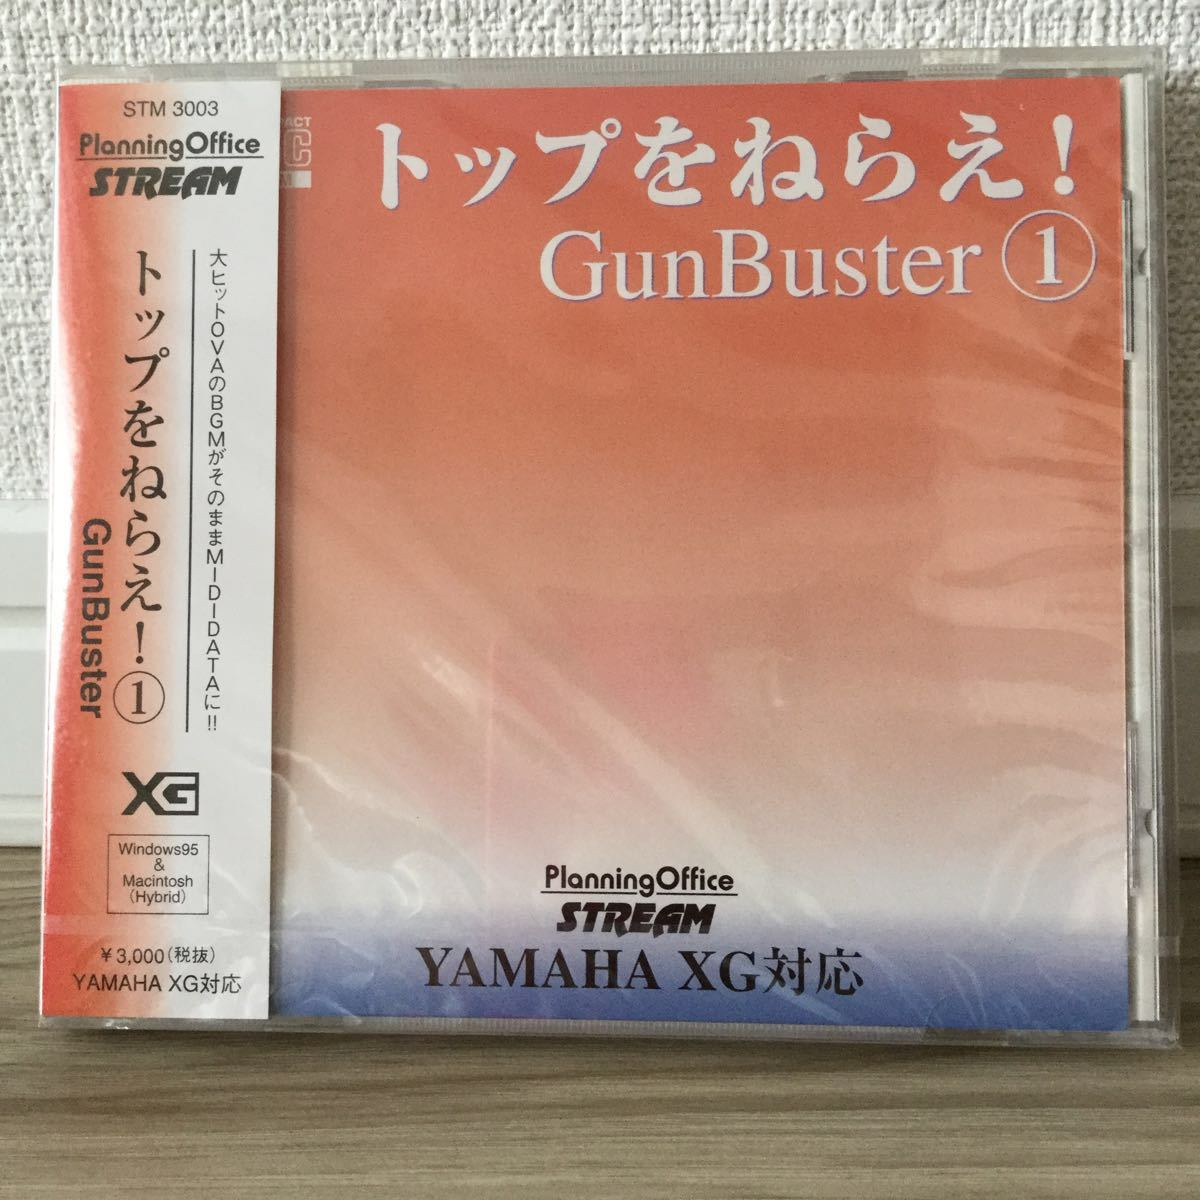 STREAM「トップをねらえ!GunBuster①~②」 SMF (Standard Midi Files) データ_画像2